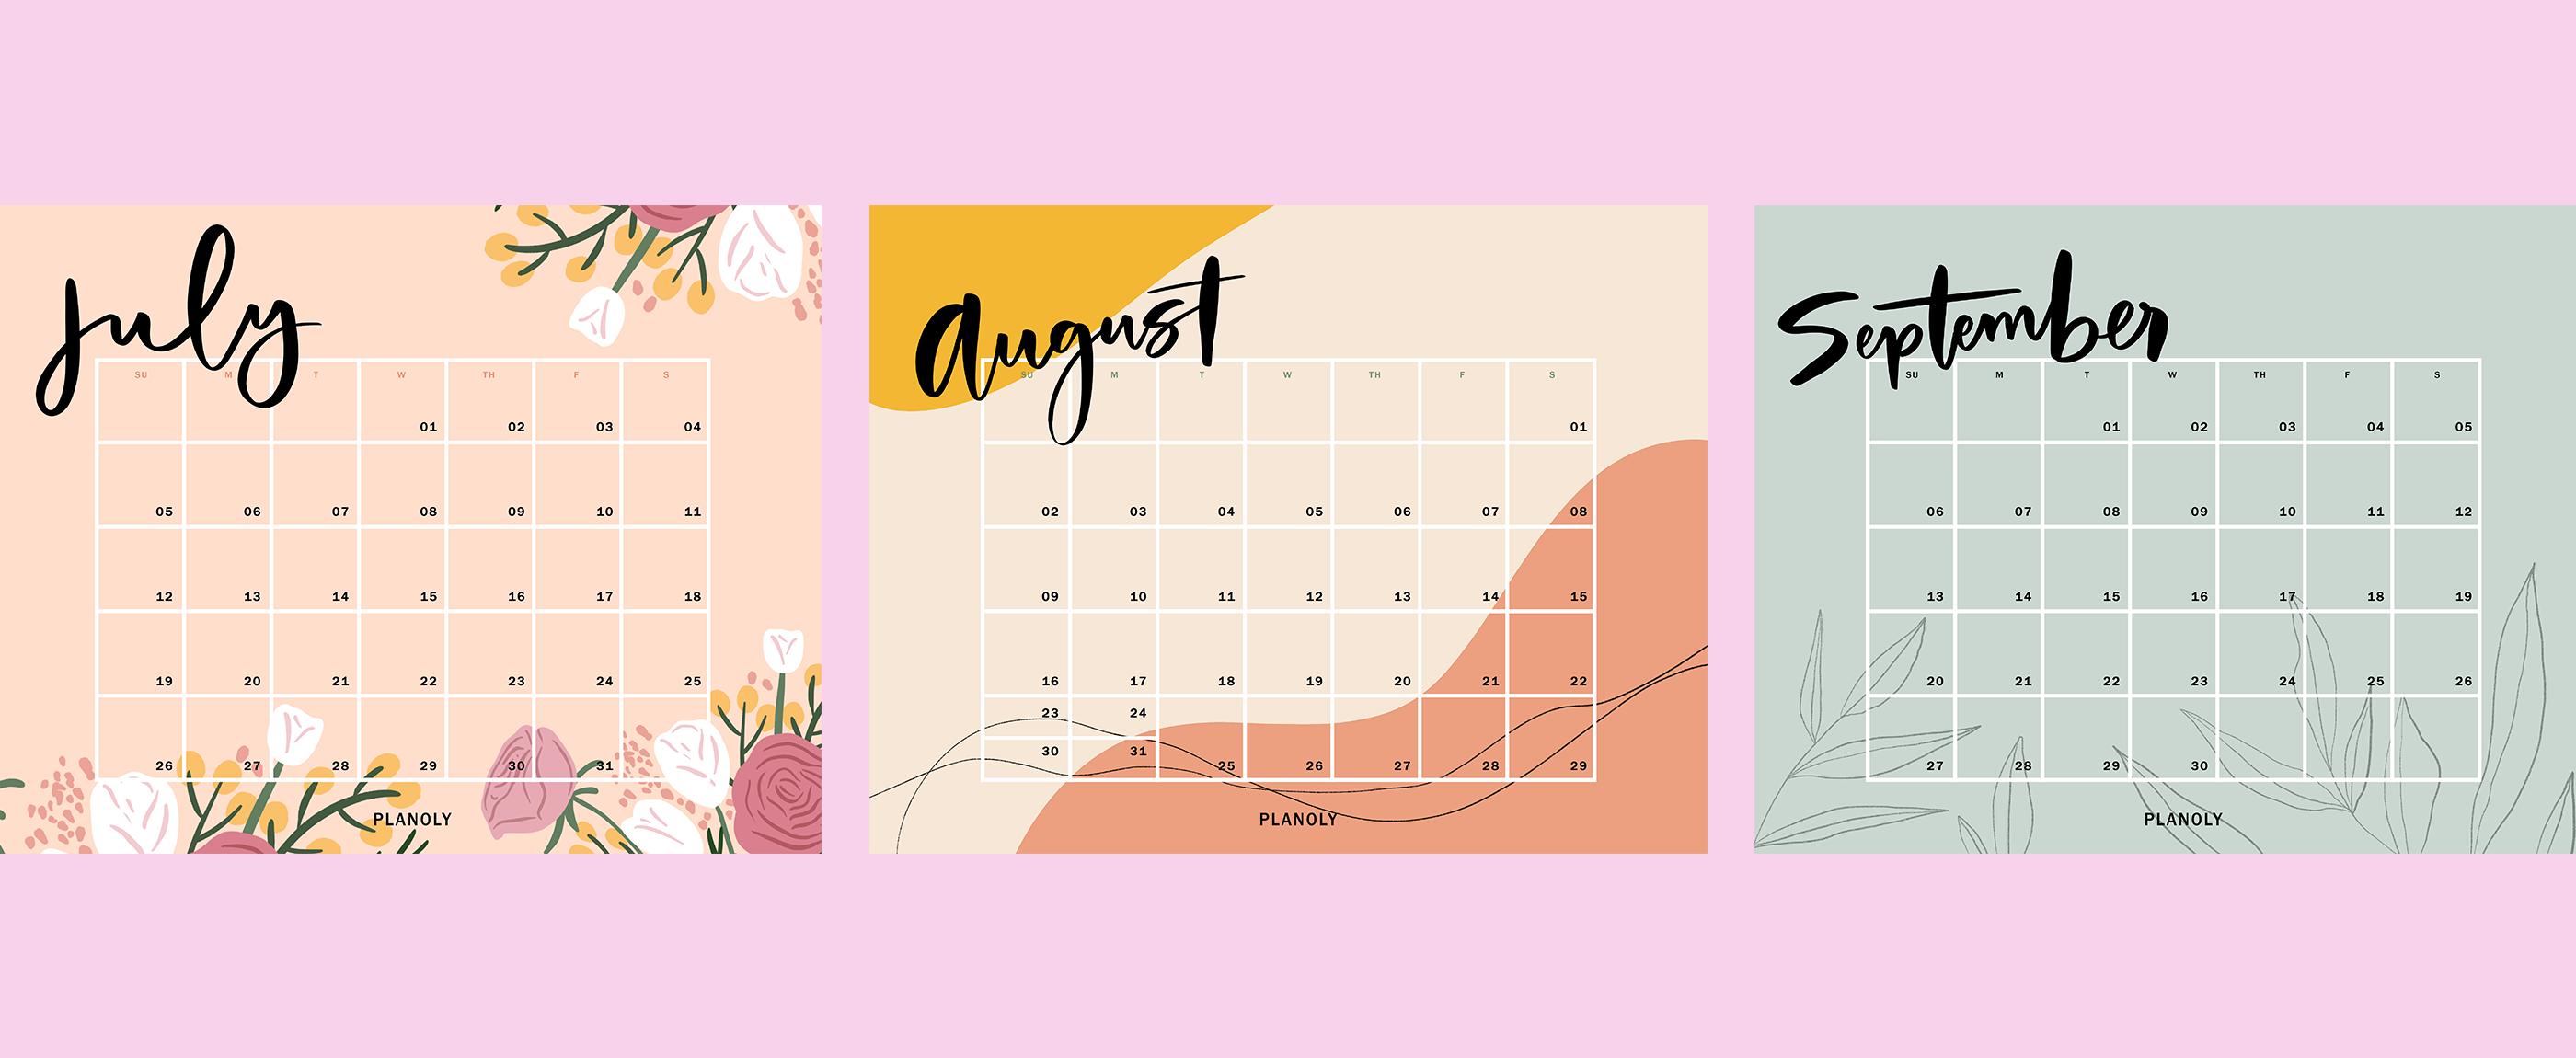 PLANOLY-Q3-Content-Calendars